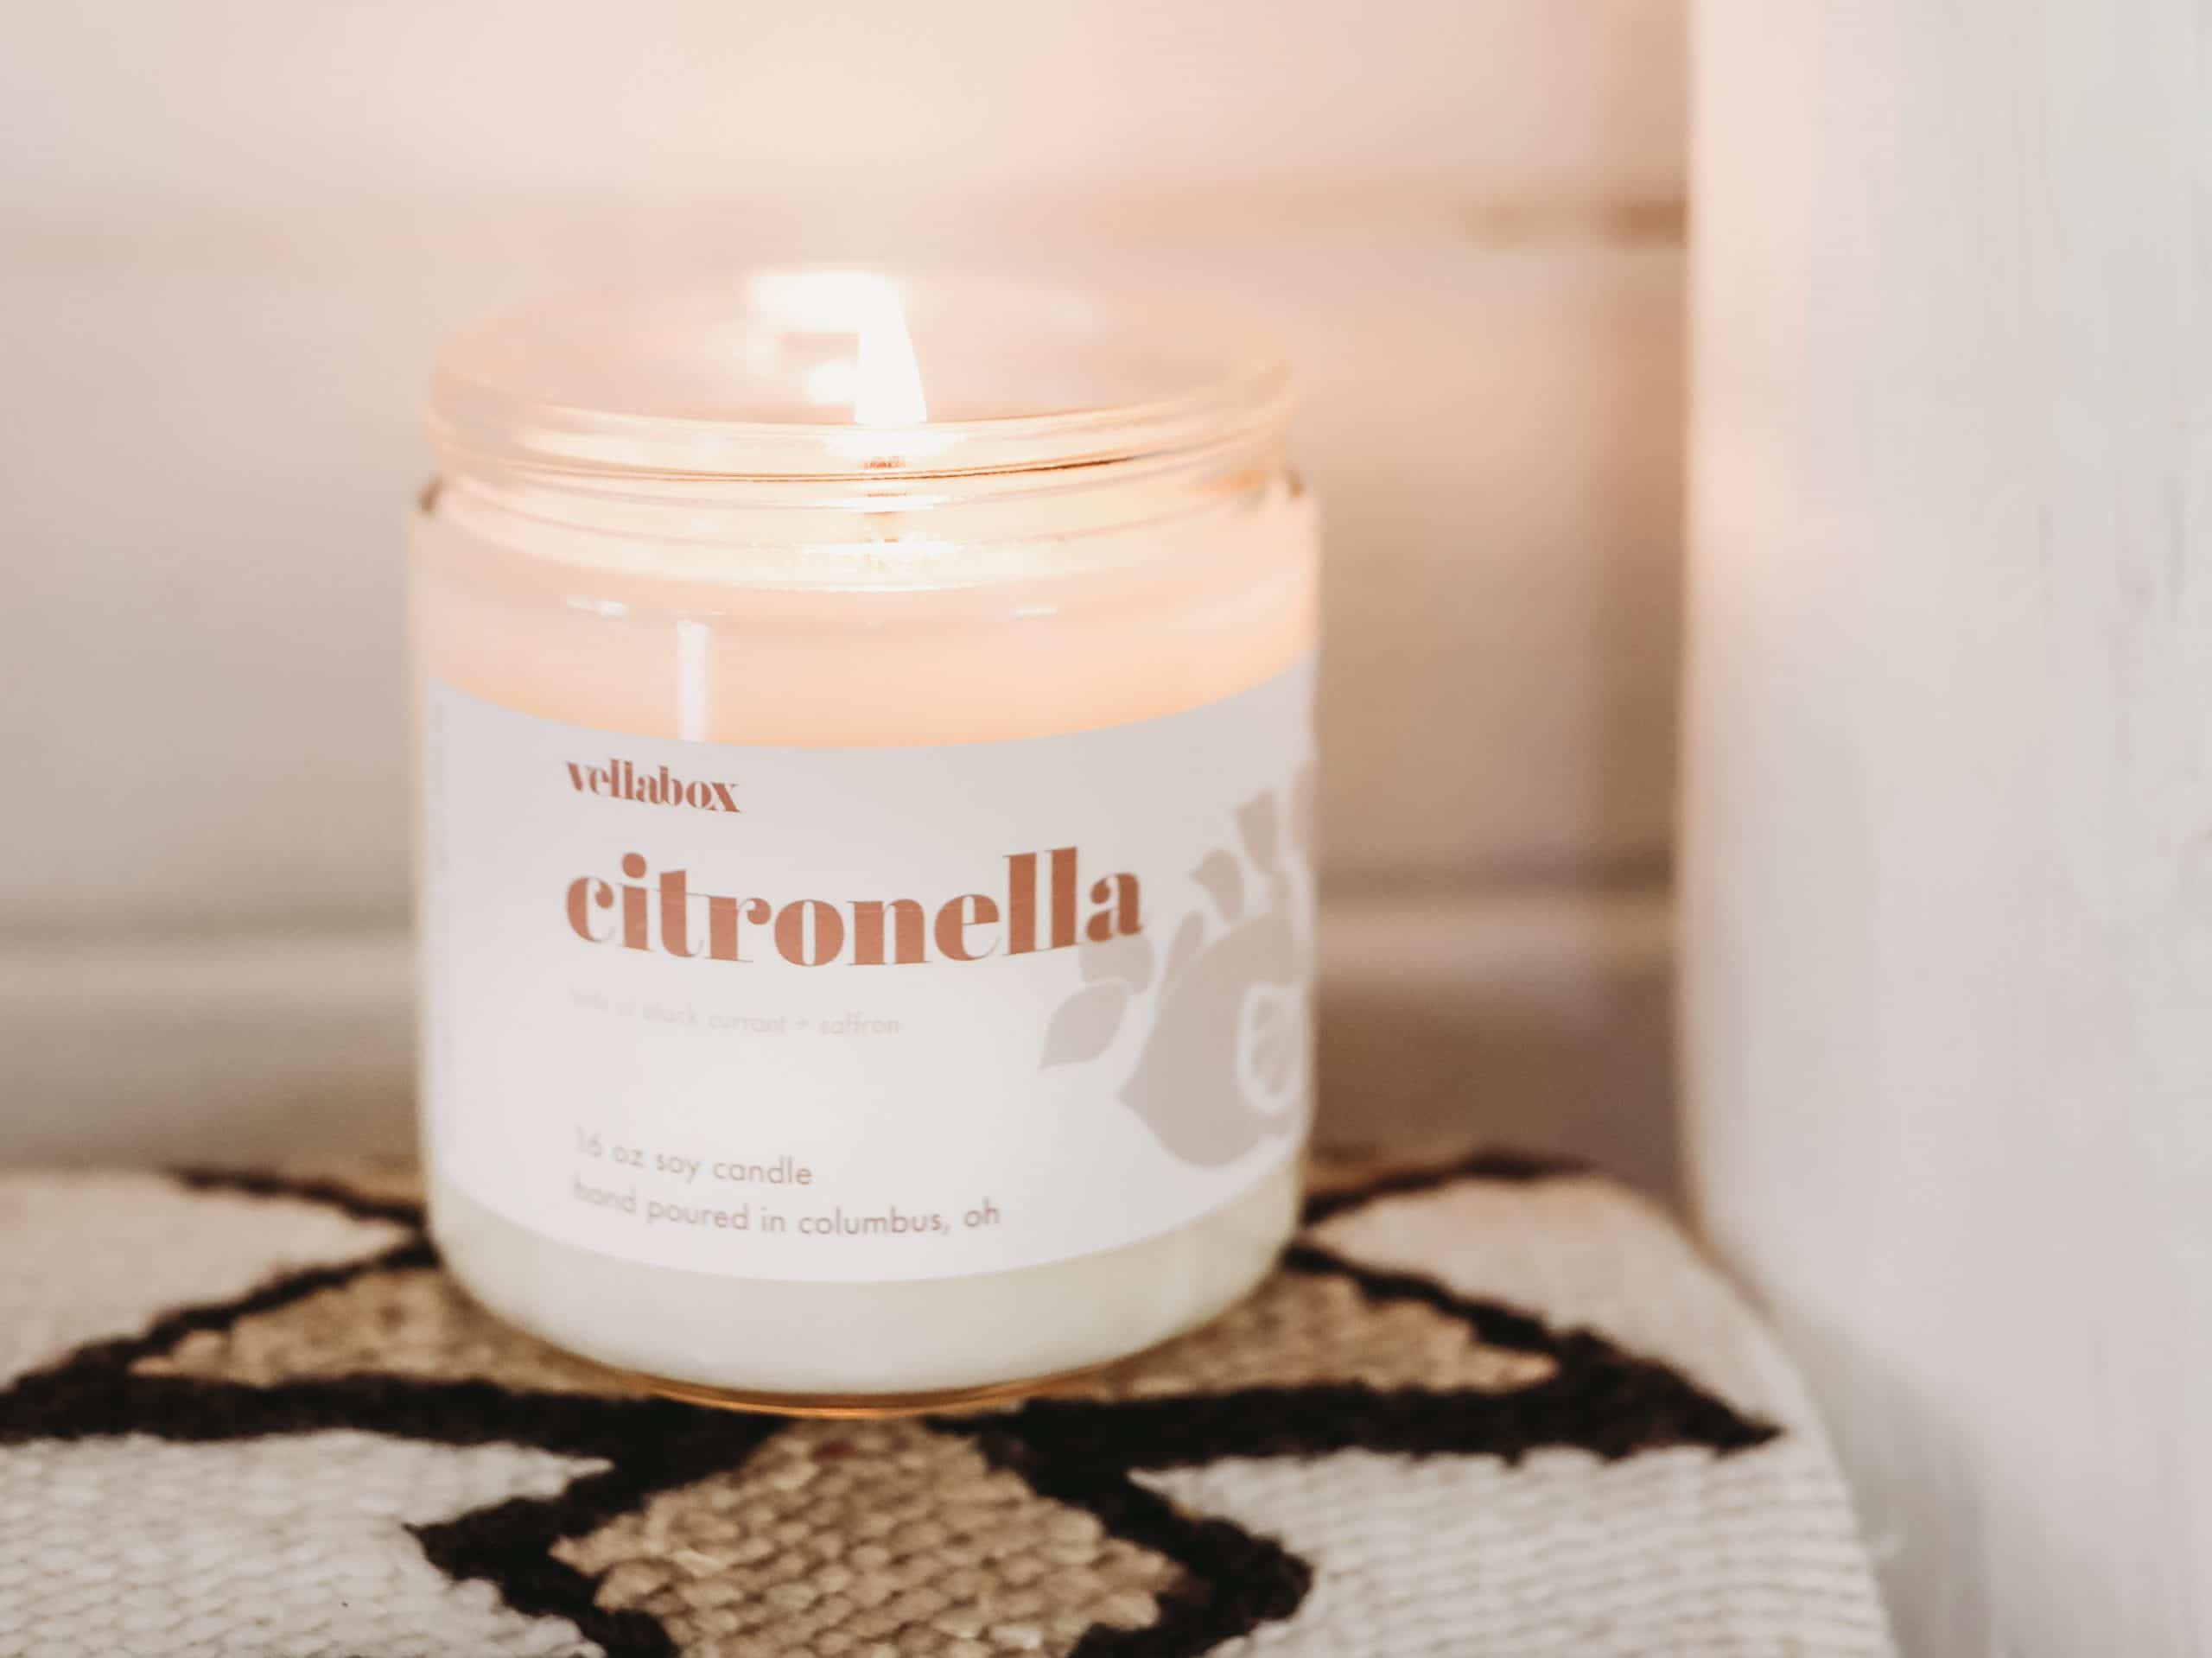 Buy Black Currant & Saffron Citronella Candle